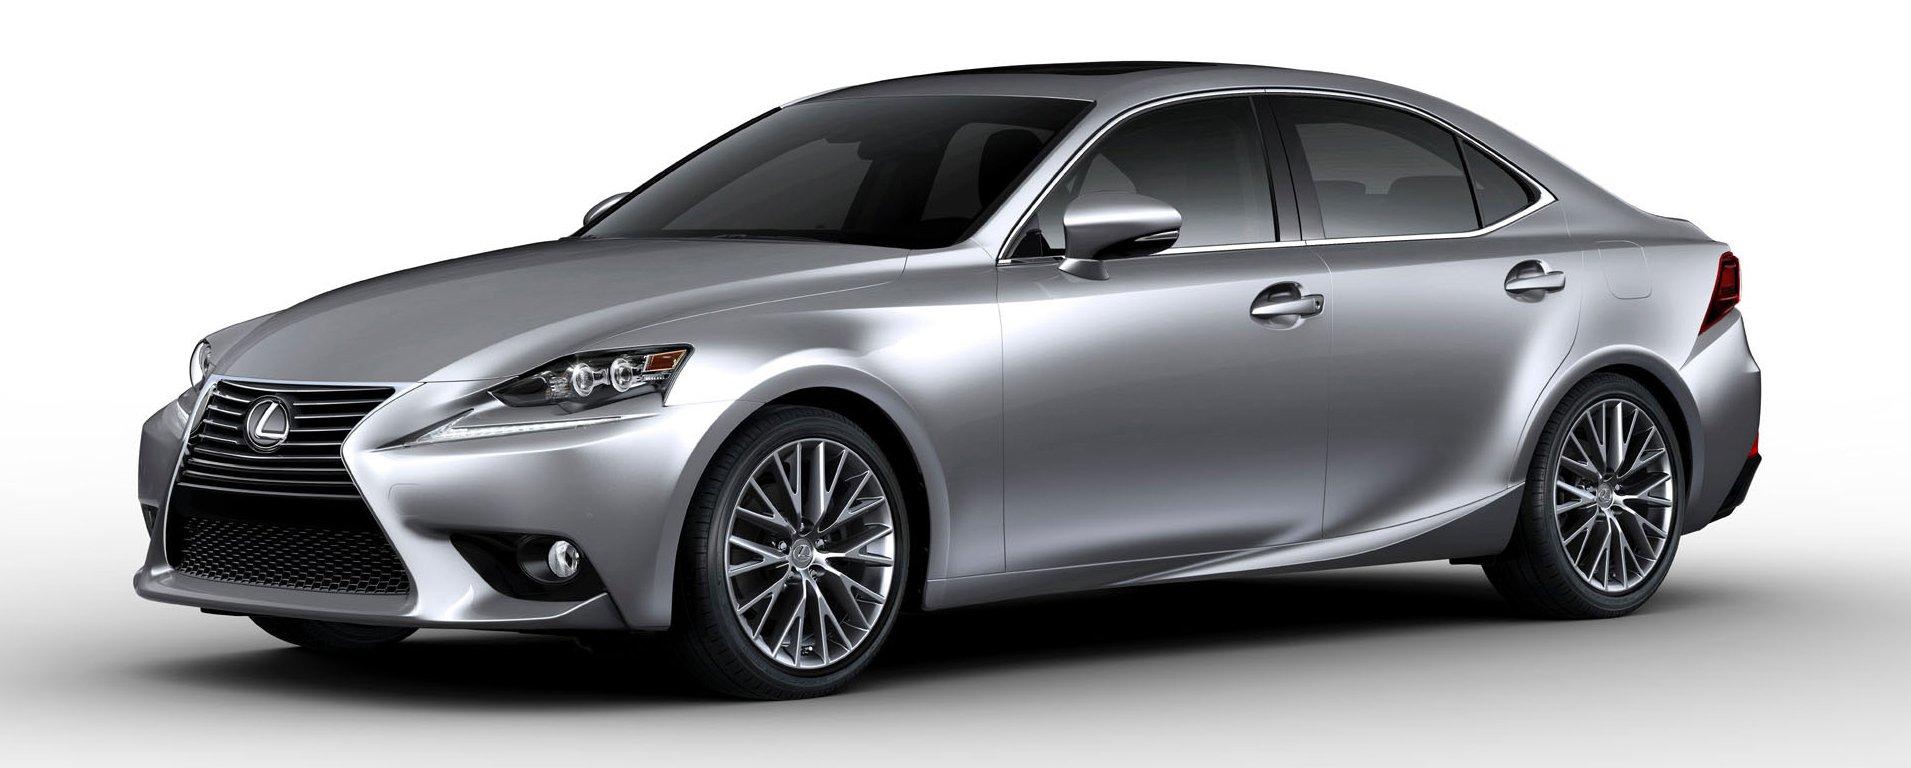 New 2014 Lexus Is Officially Revealed U2013 Is 250, Is 350, F Sport